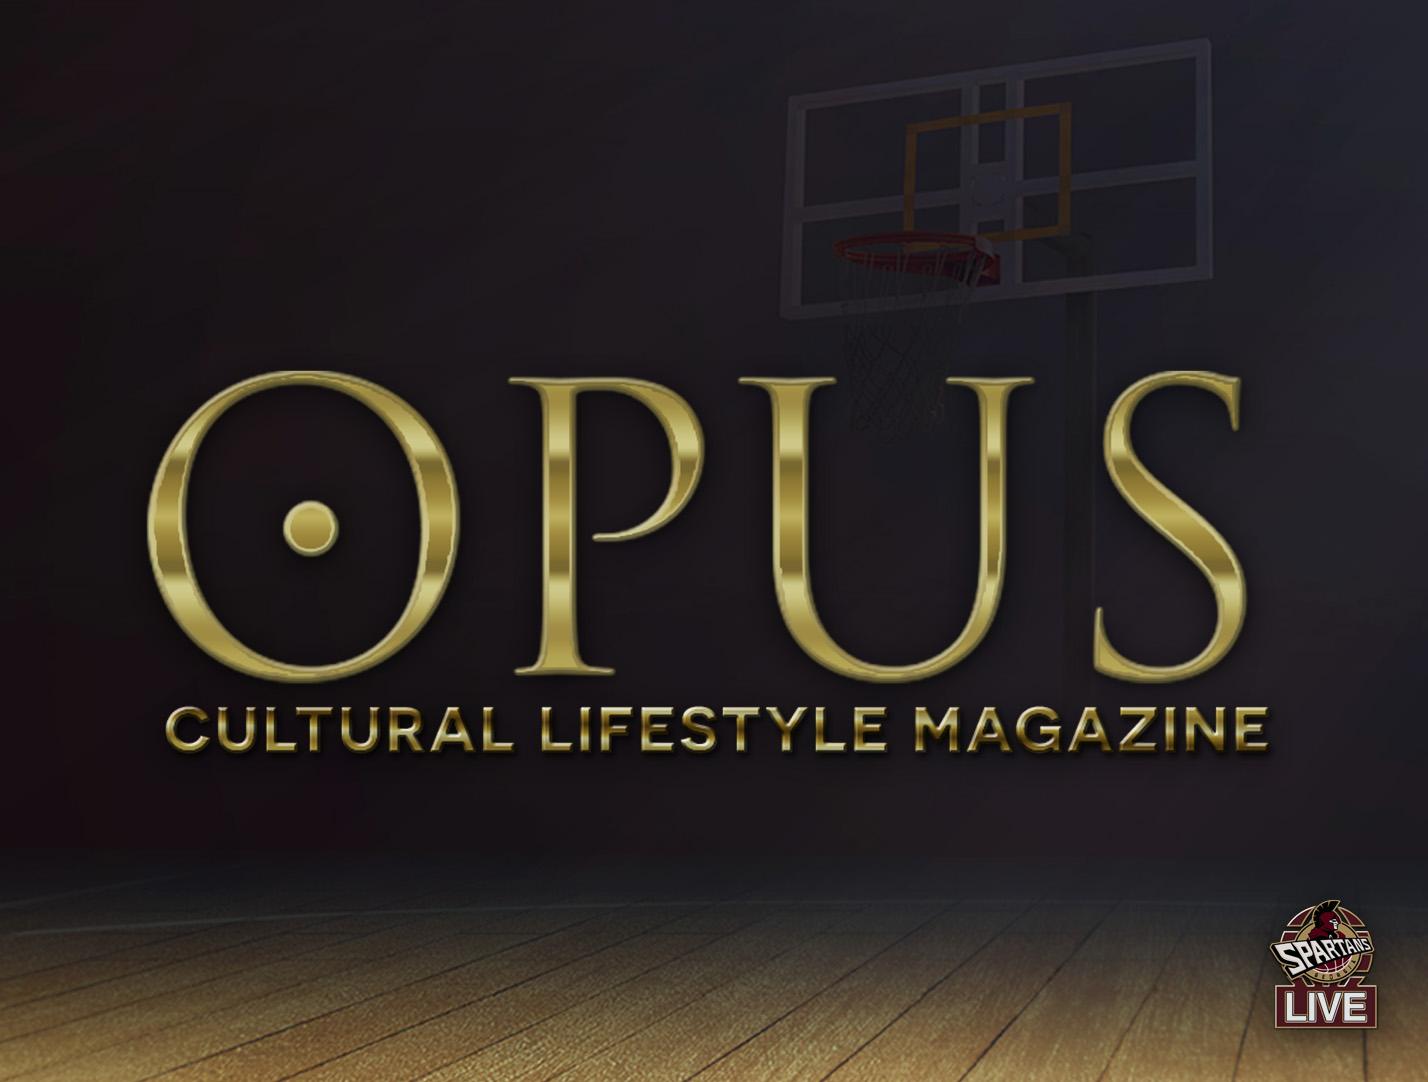 Opus Cultural Lifestyle Magazine Georgia Spartans Team Sponsor